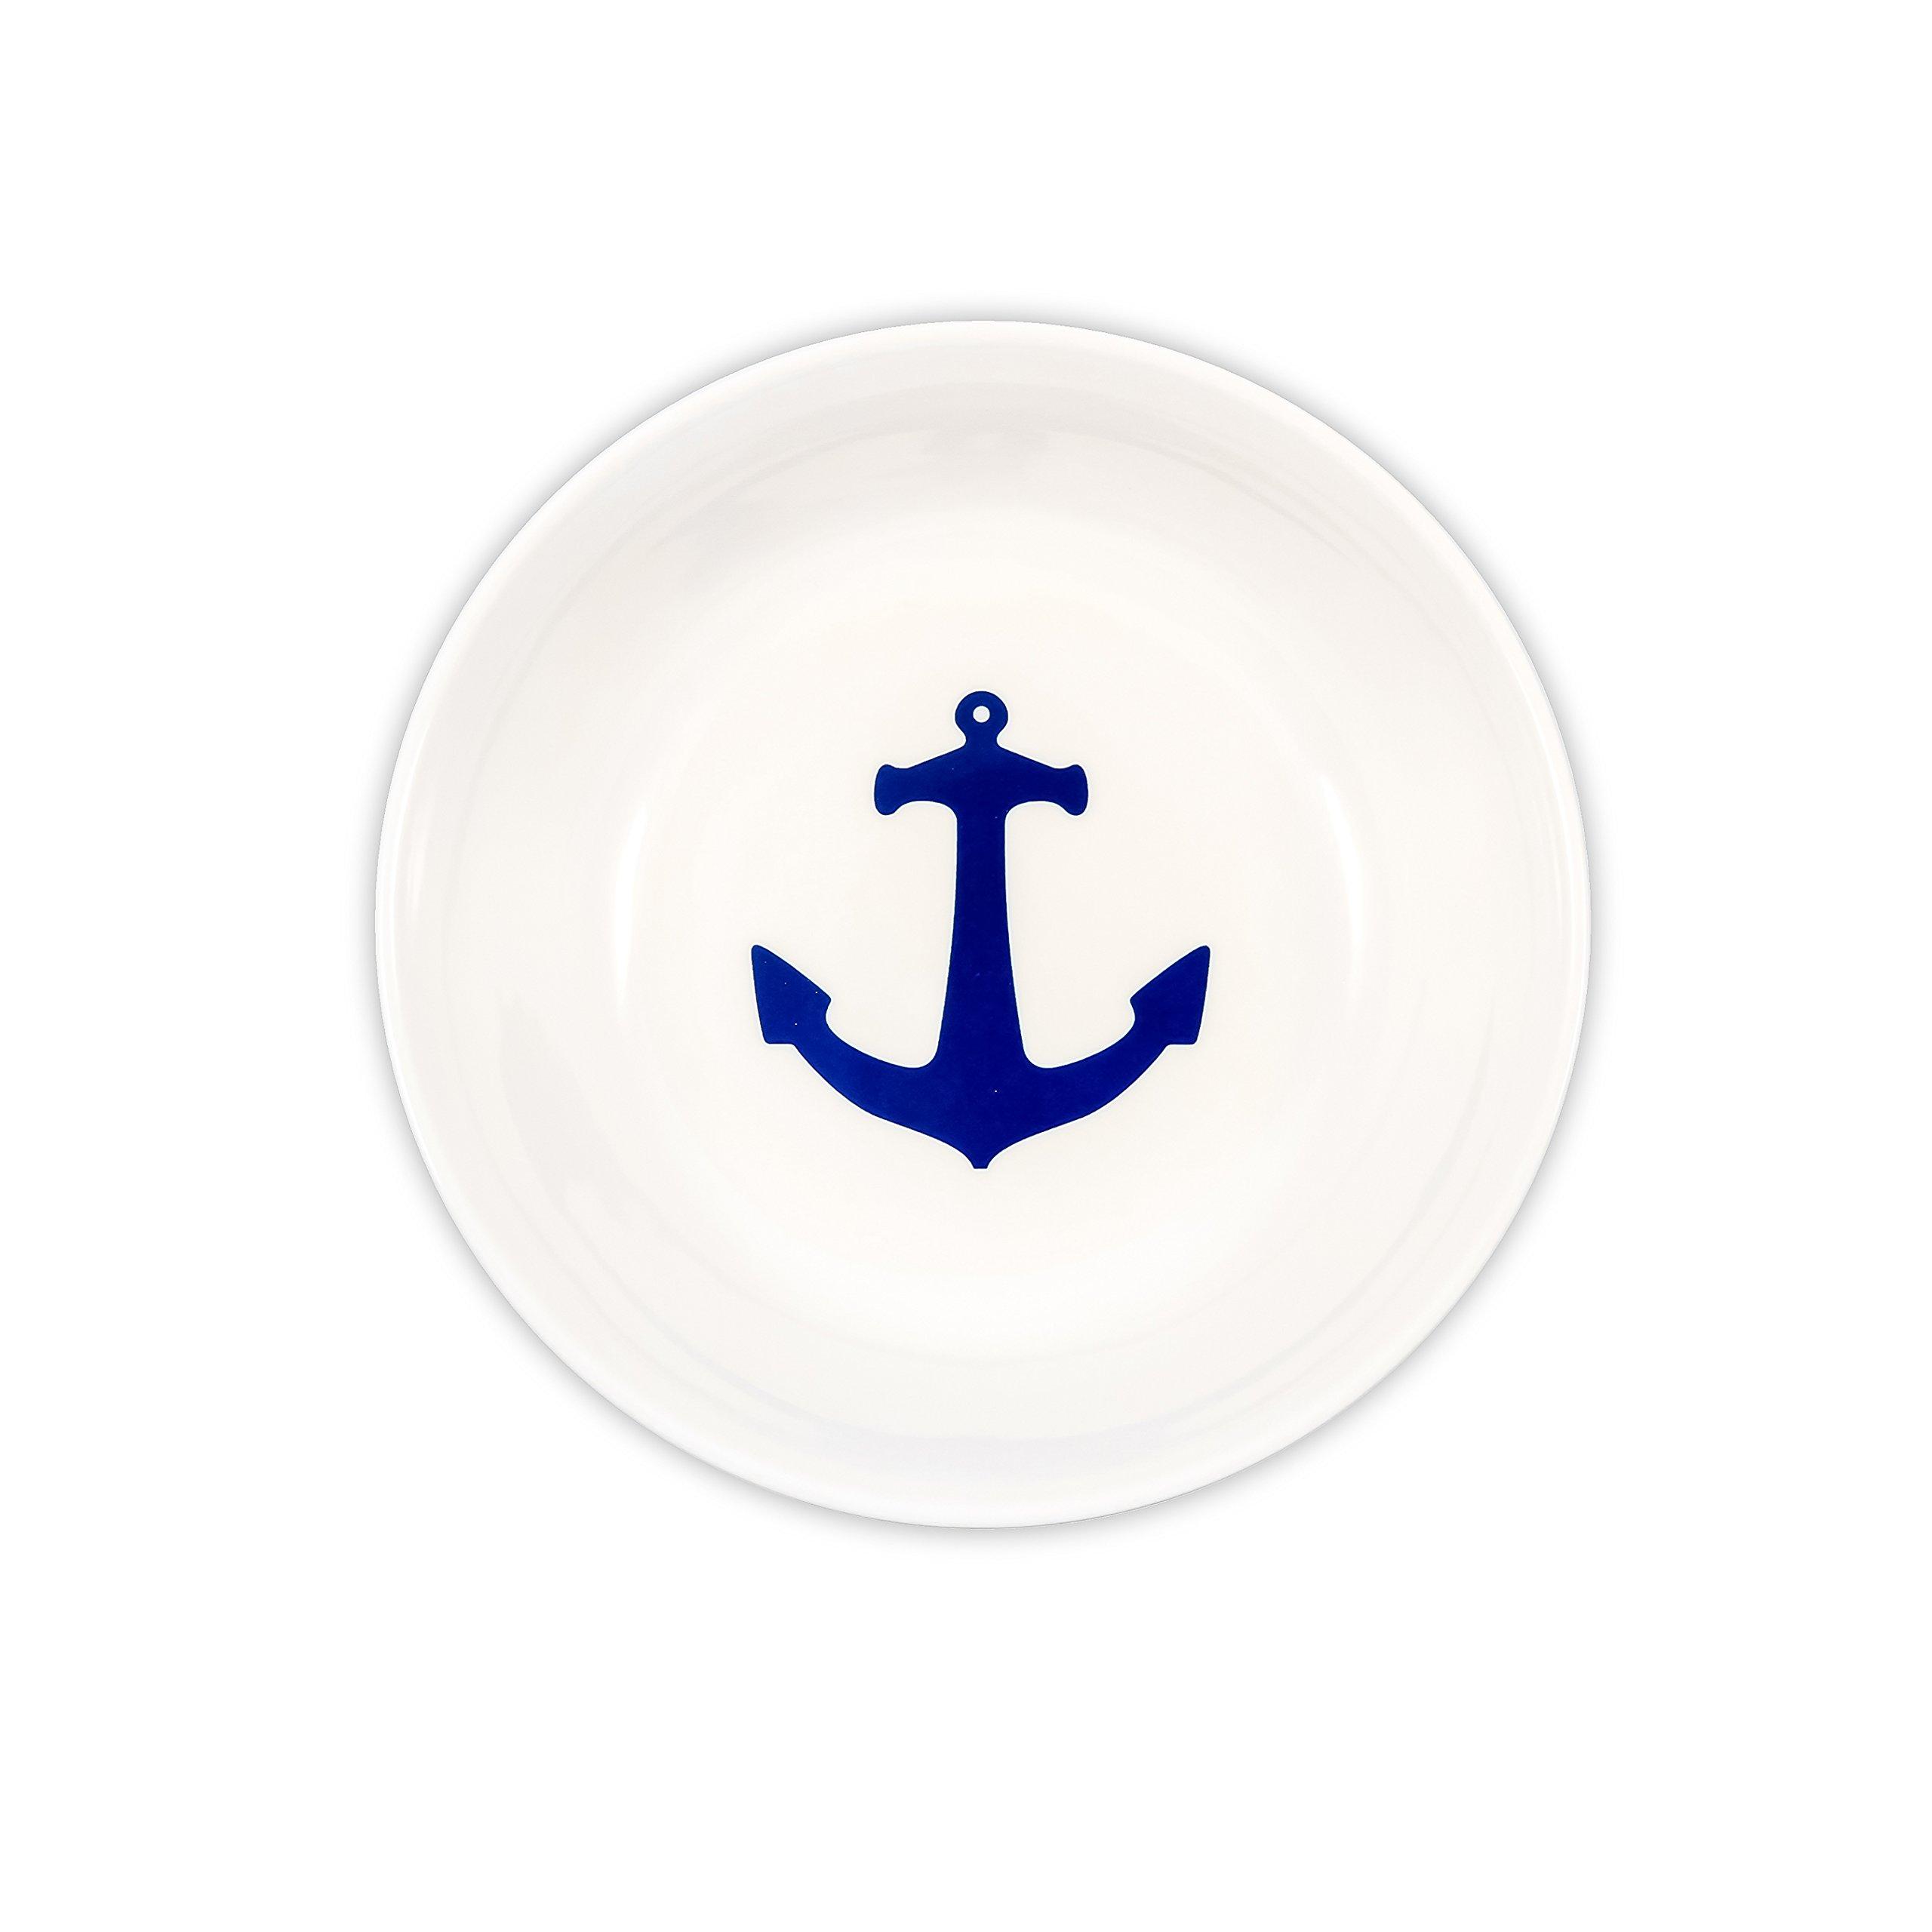 Camco 41951 Melamine Marine Dinnerware (12 Piece Set) by Camco (Image #7)